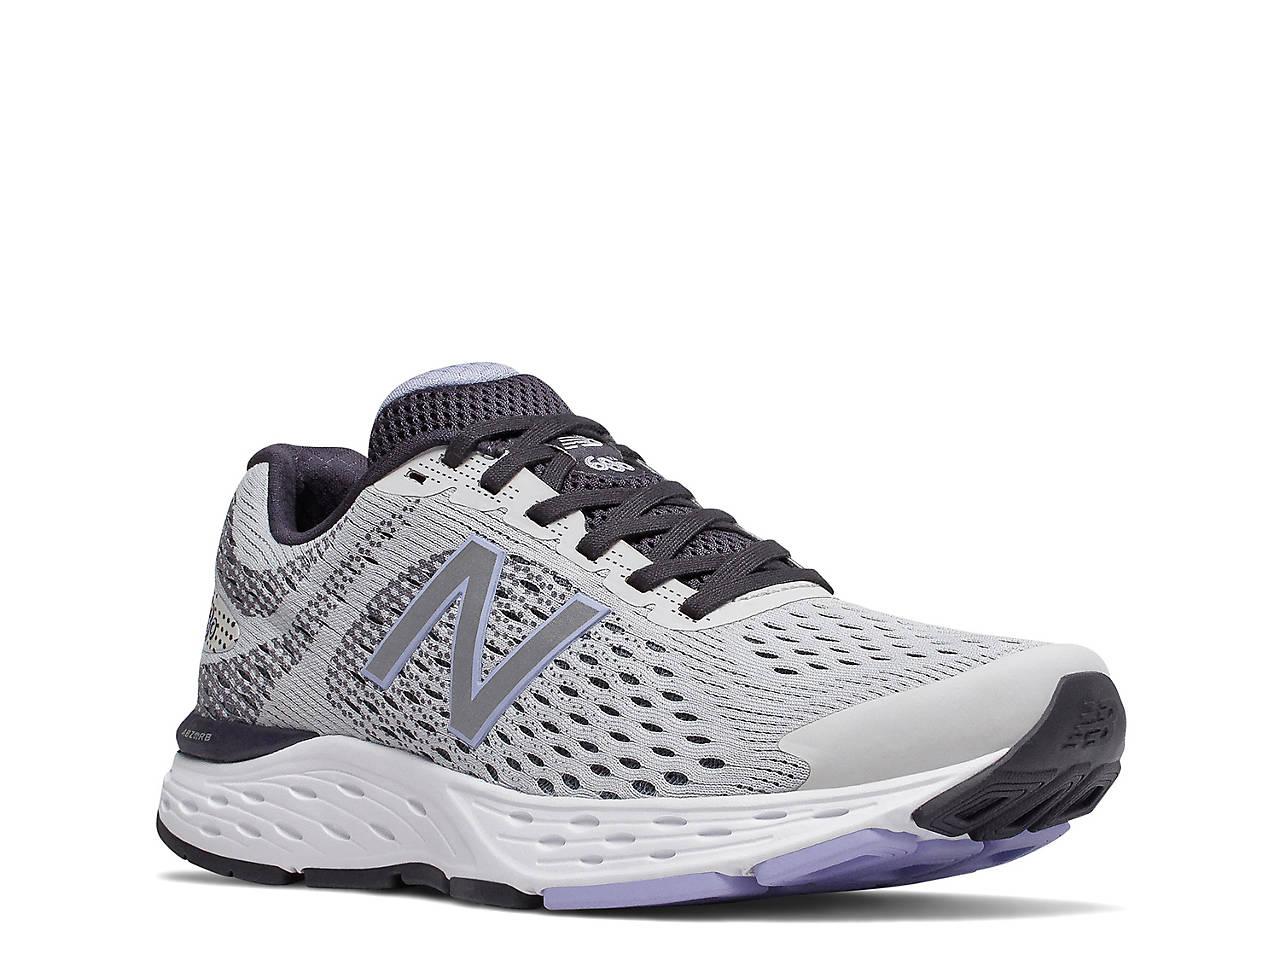 680 v6 Lightweight Running Shoe Women's